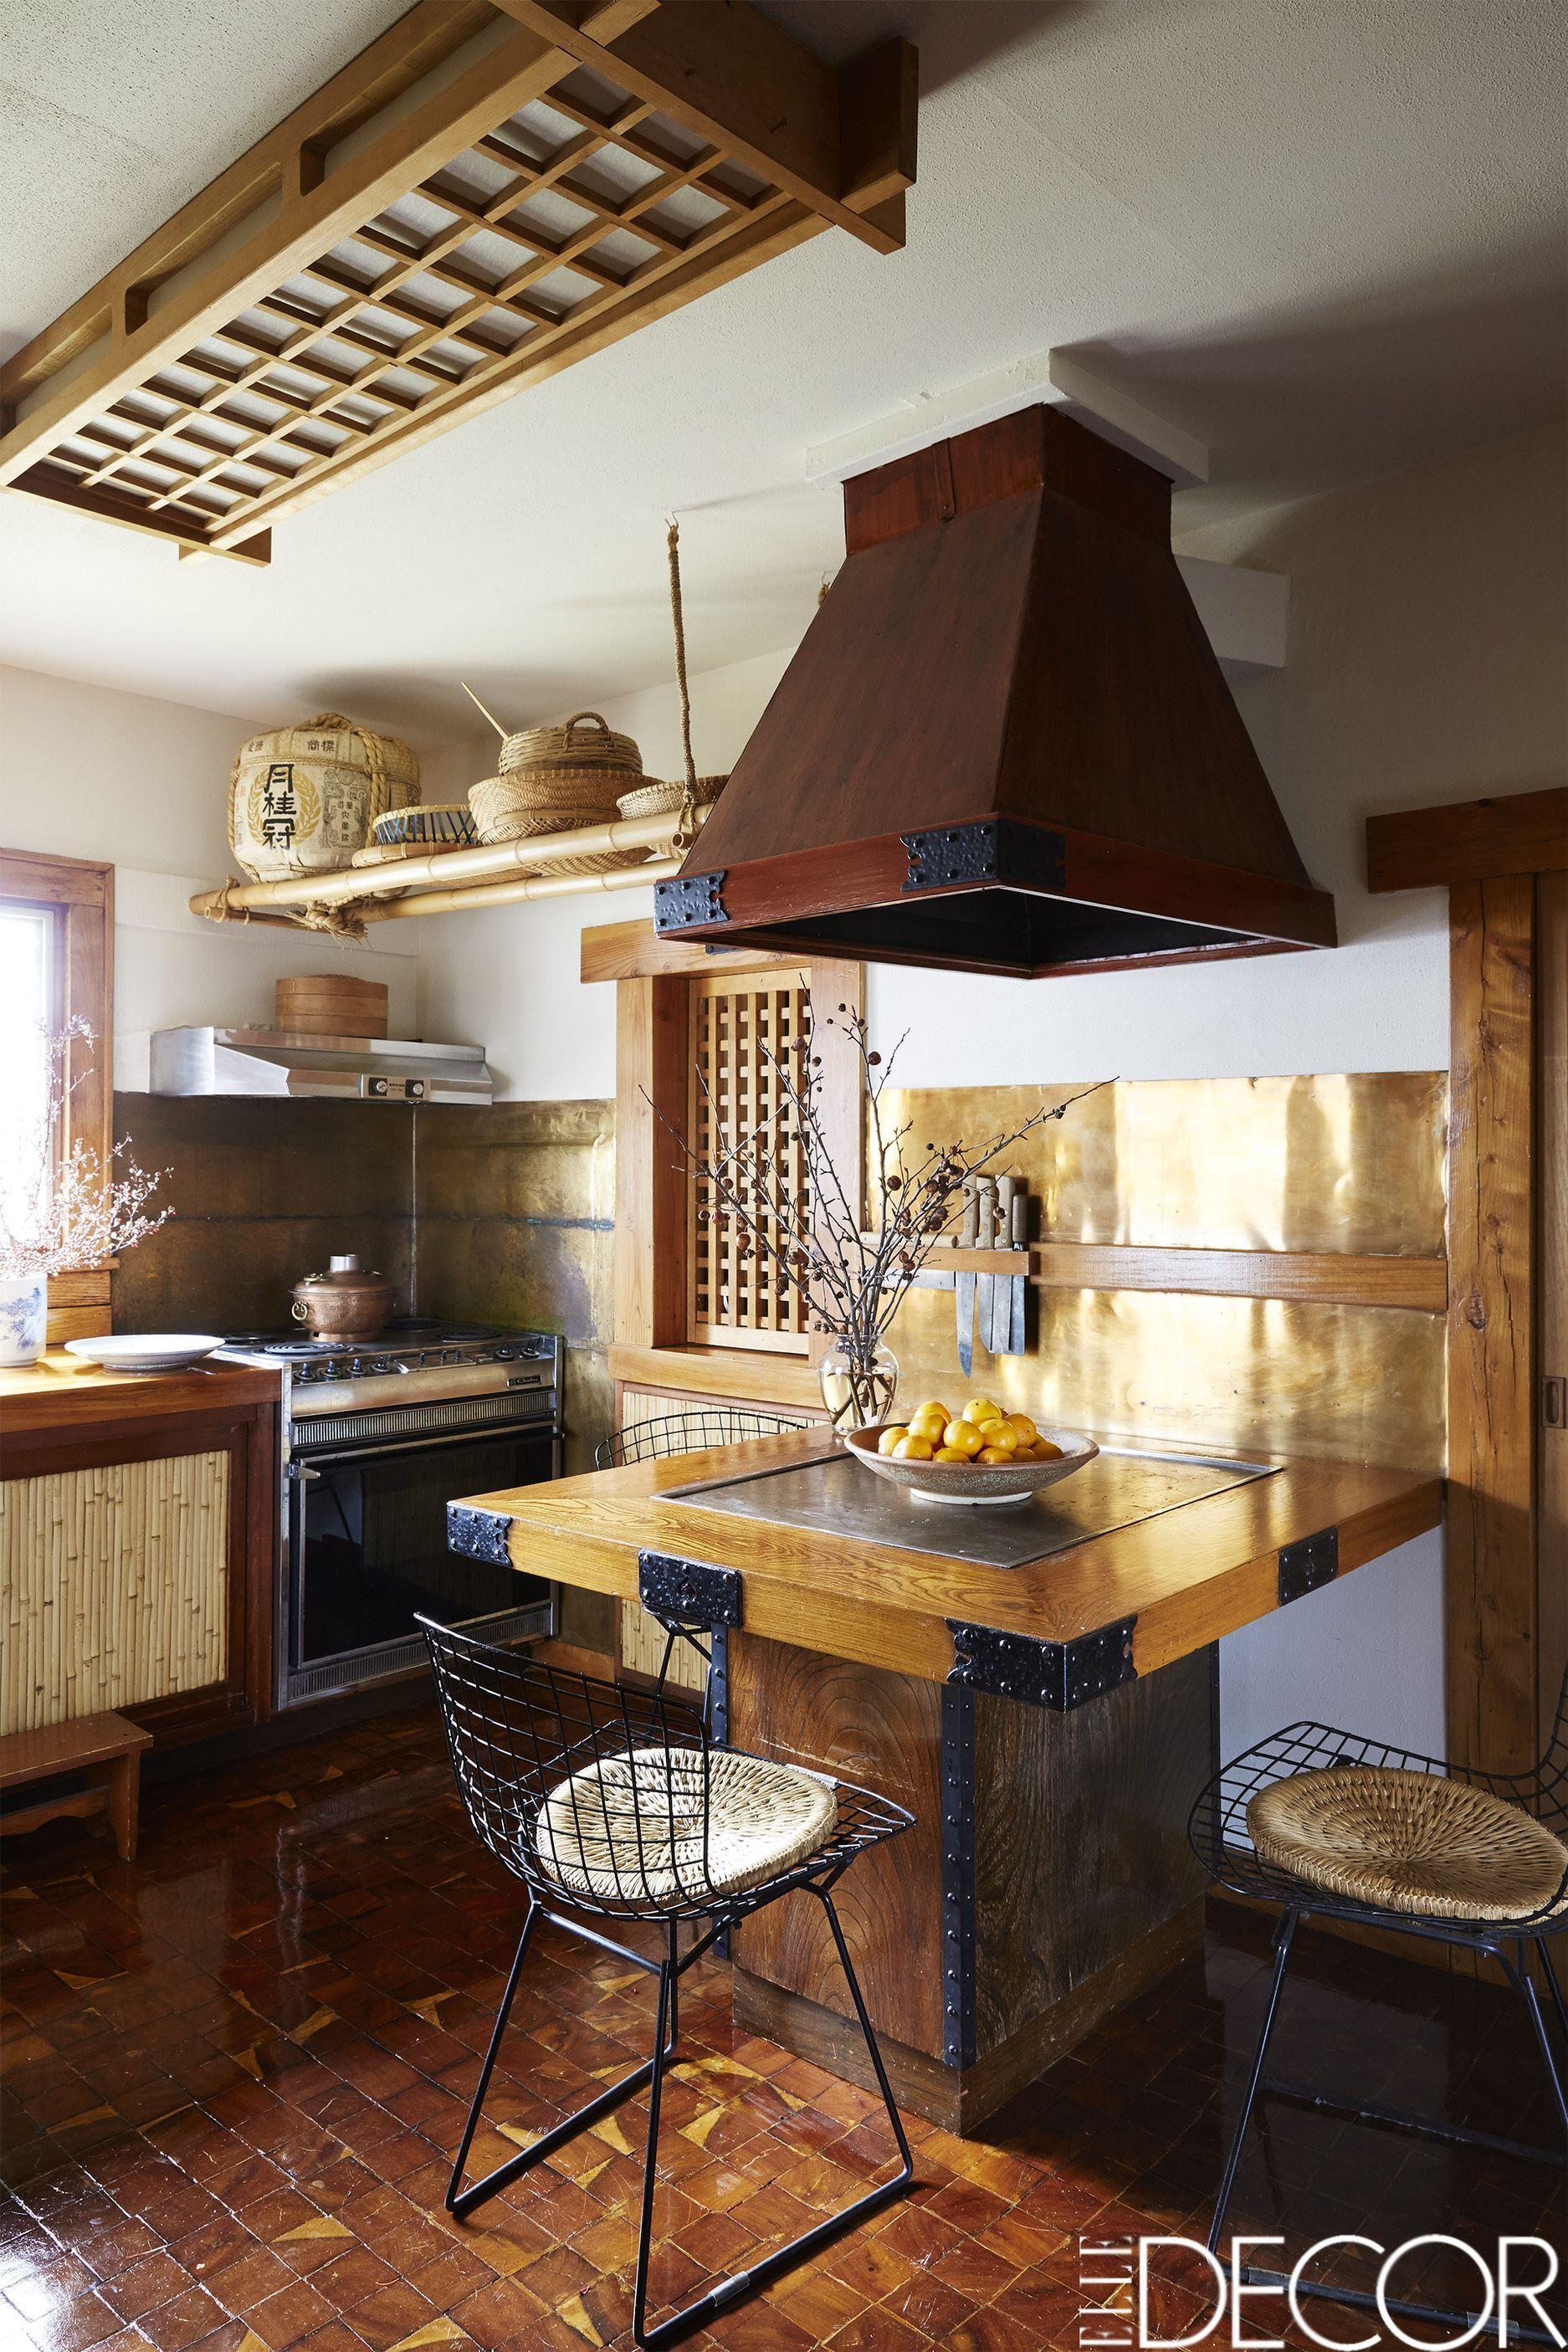 Best House Decorations Home Ornamentations Darbylanefurniturecom